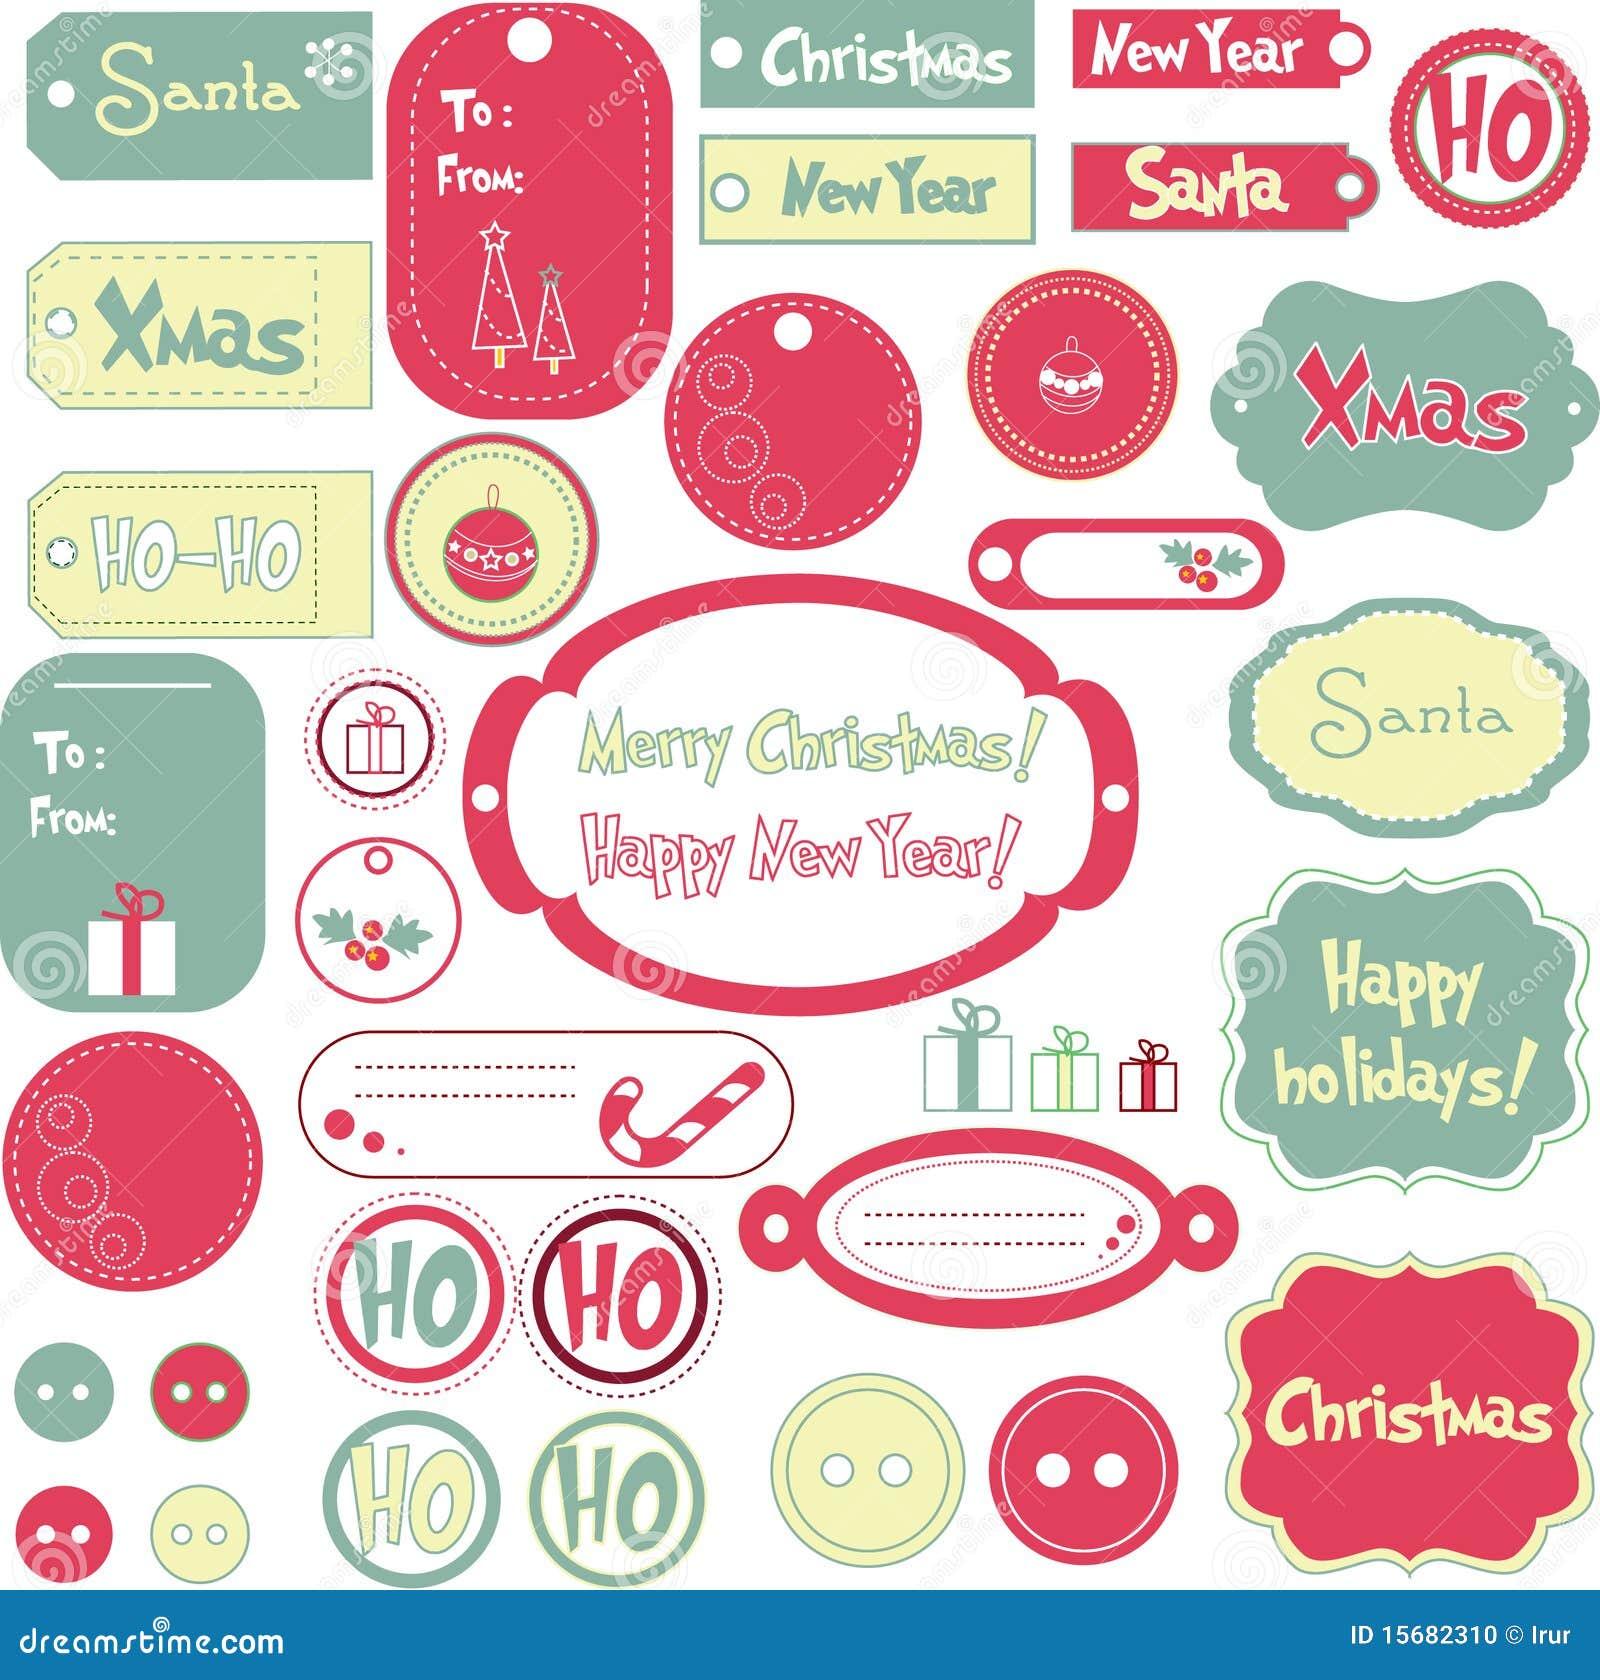 Christmas Bells Royalty Free Stock Image - Image: 2666066